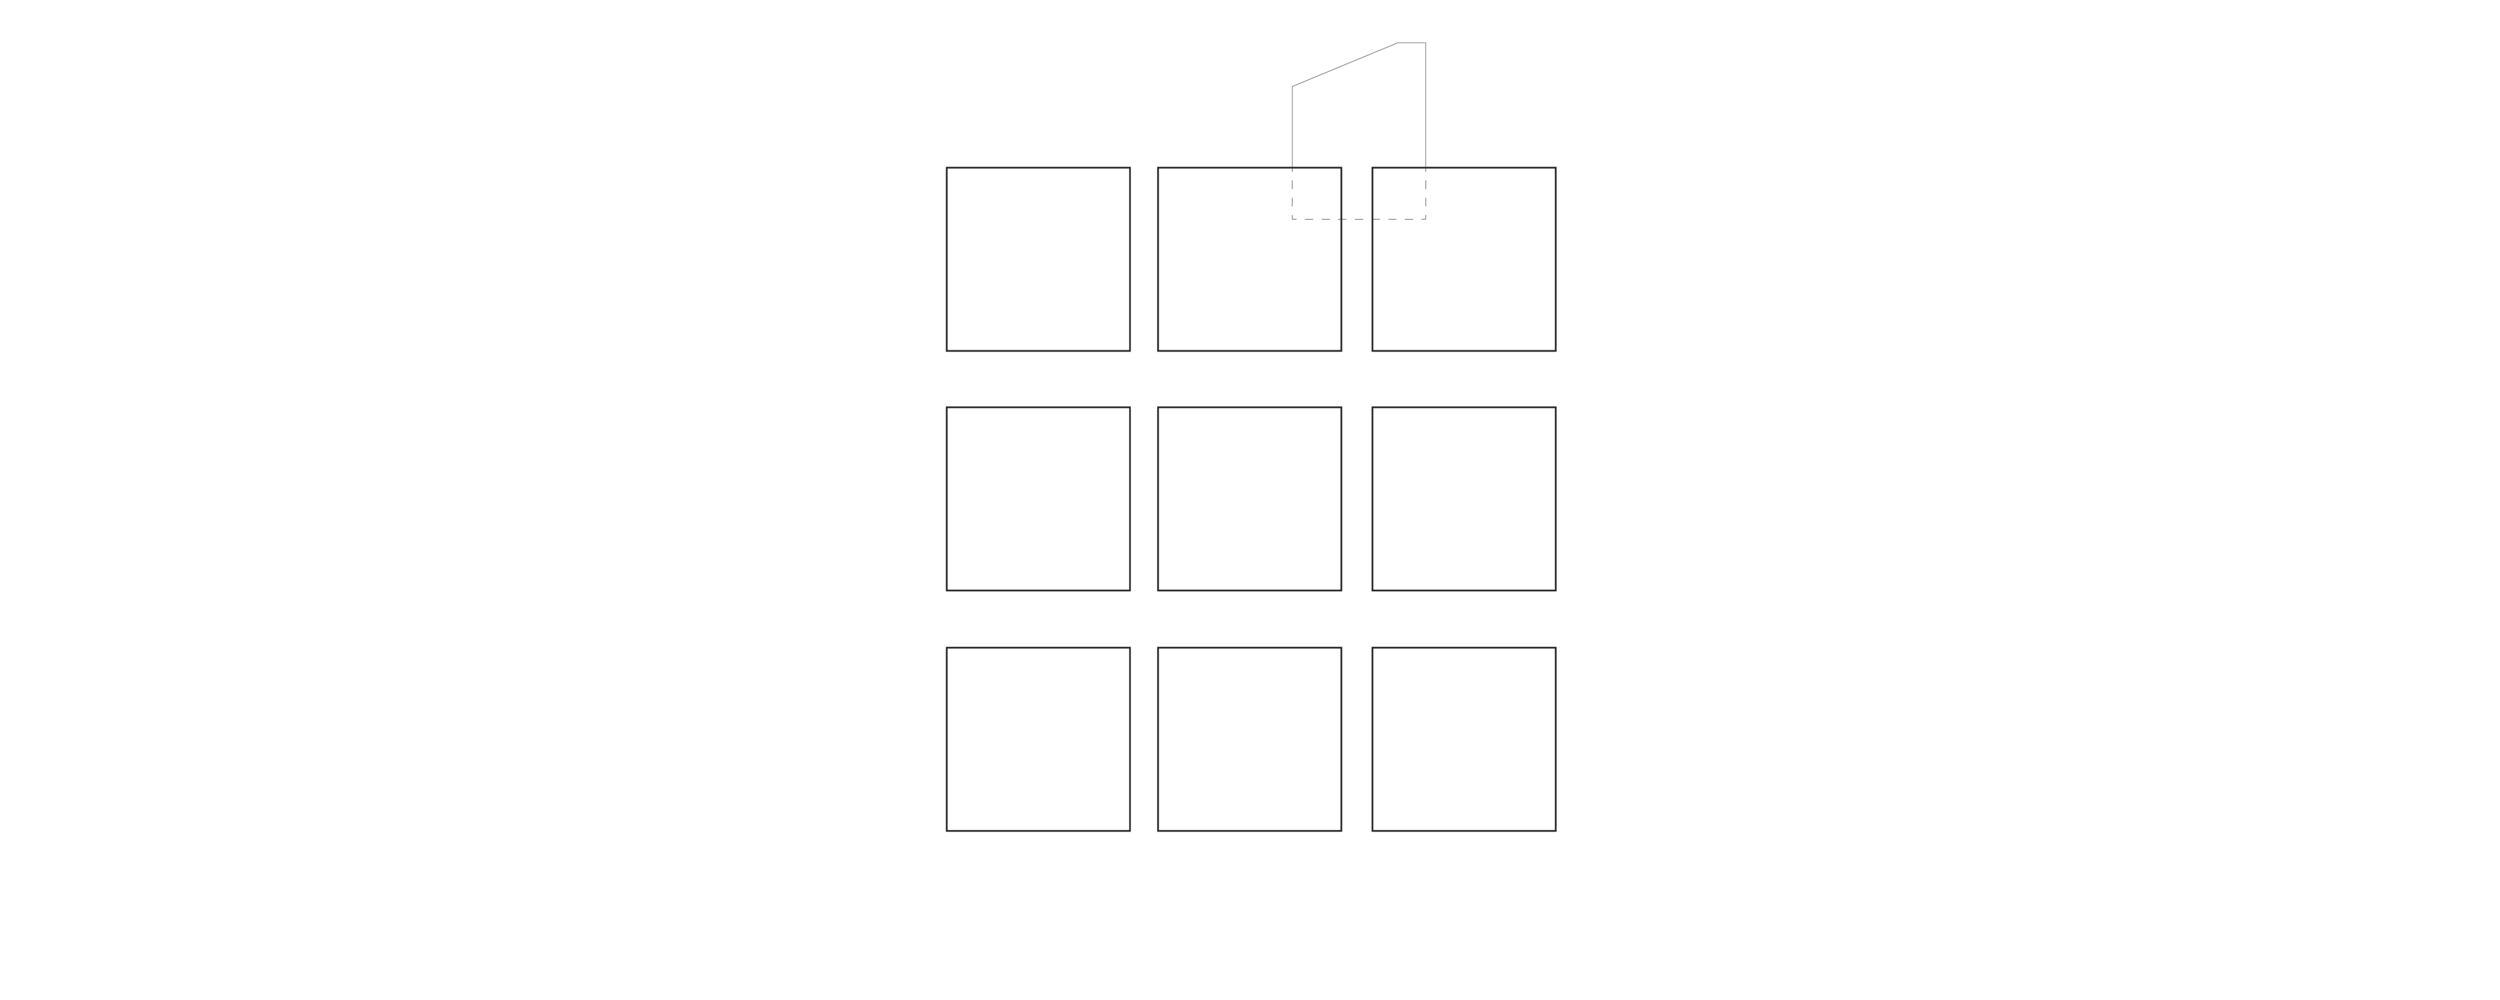 Linework Thumbnails - New-12.png